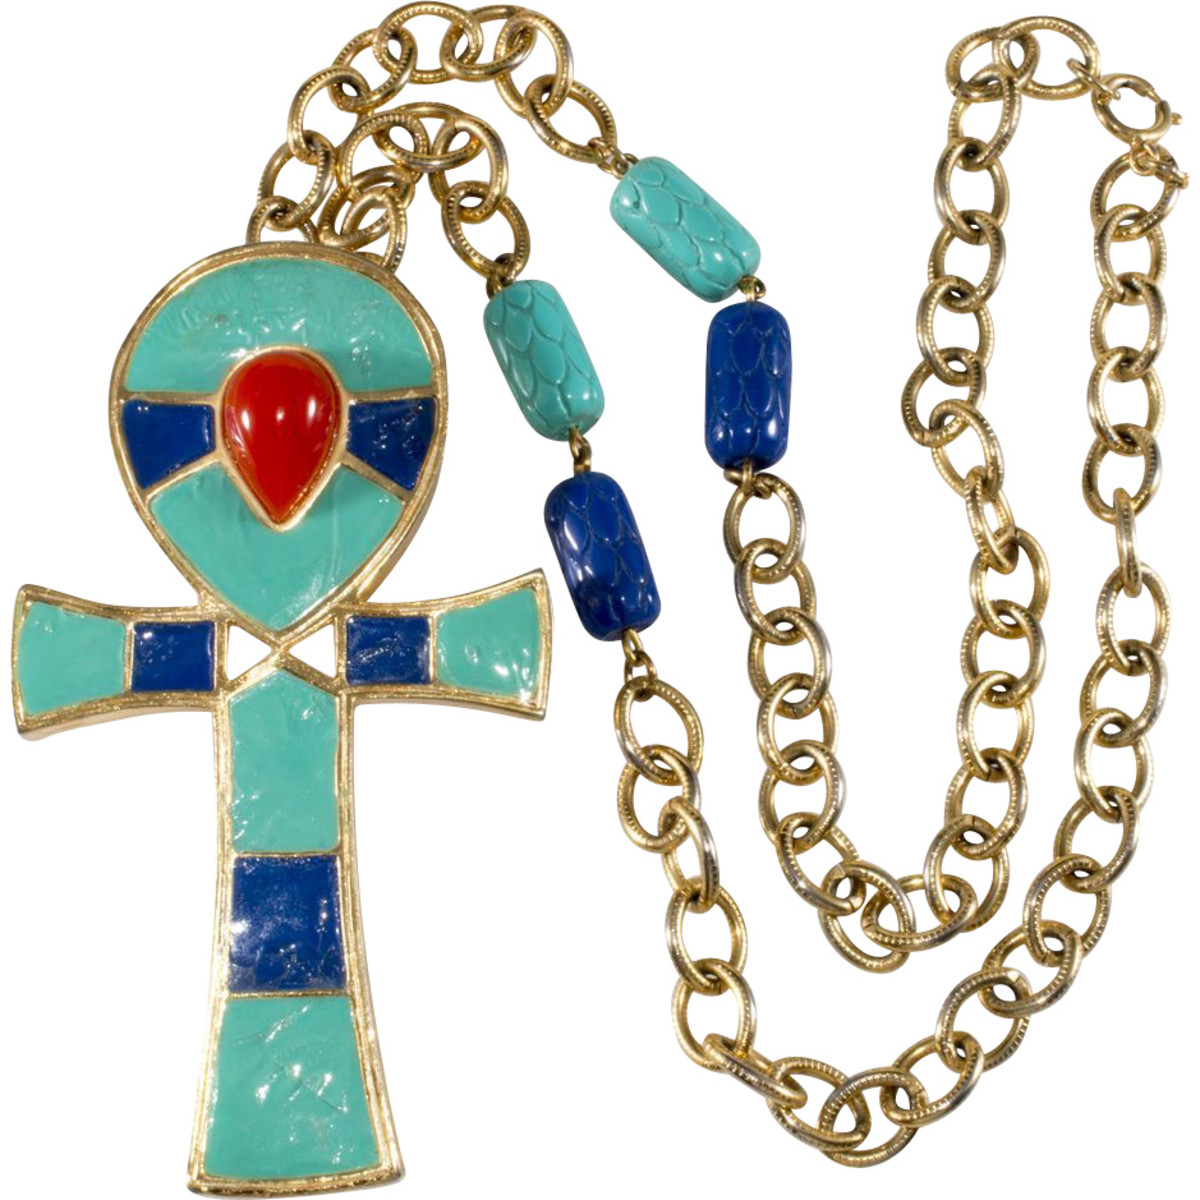 Hattie Carnegie Egyptian revival Ankh necklace